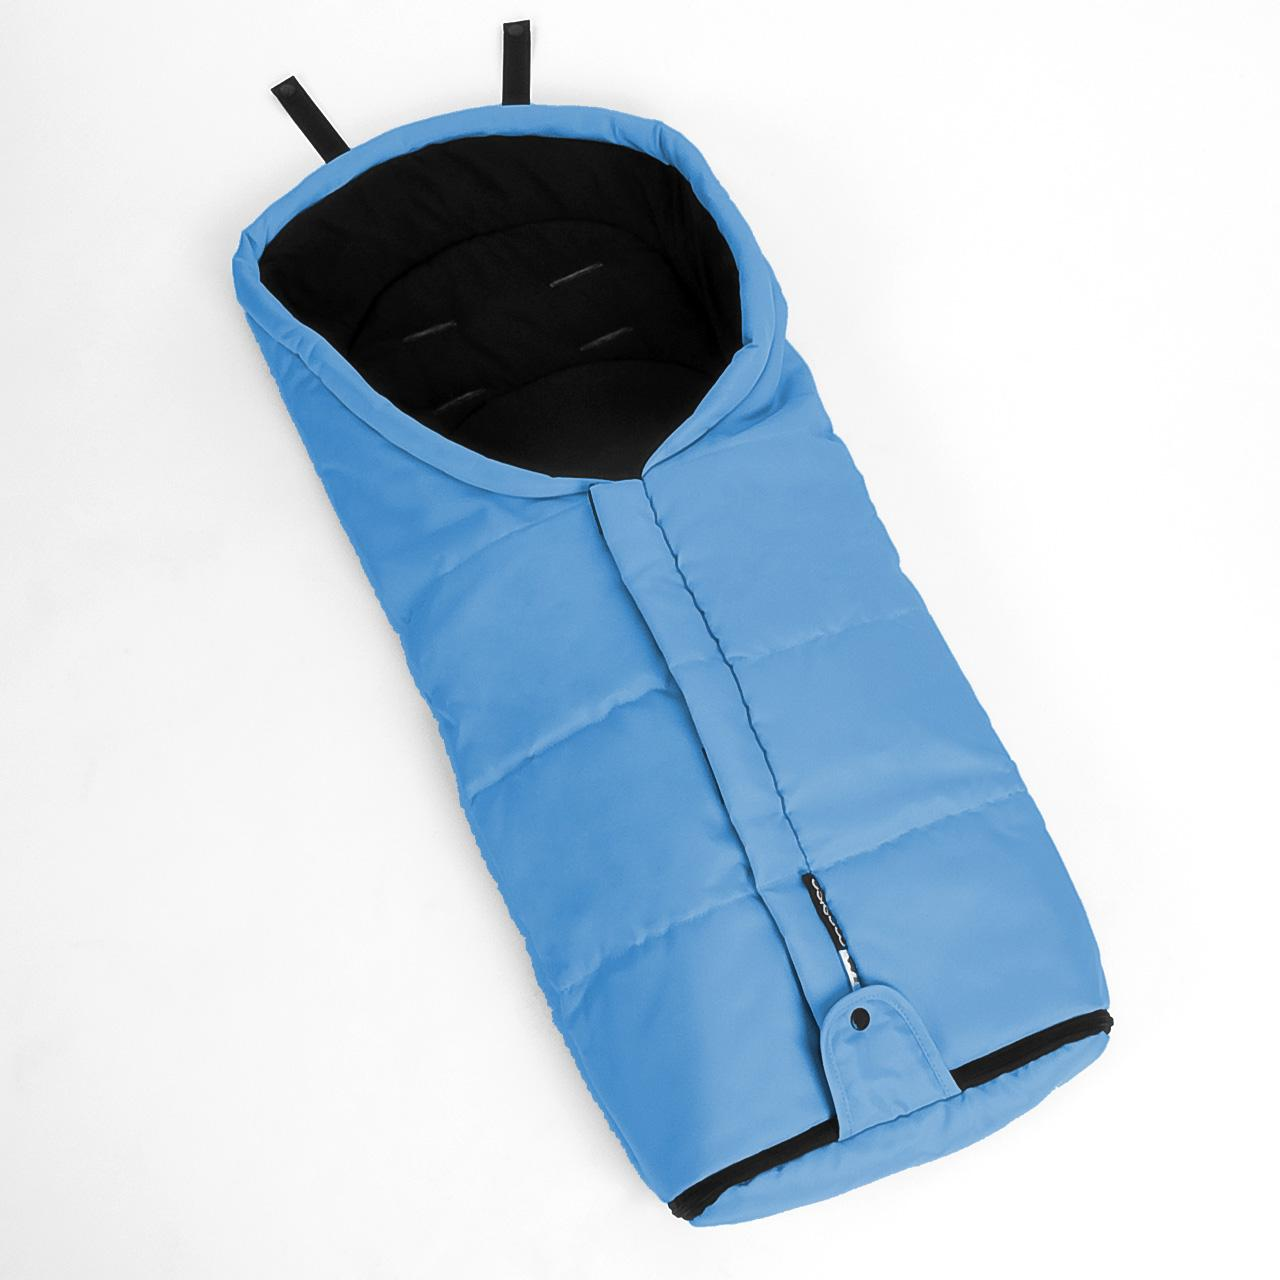 schlafsack babyschlafsack kinderschlafsack babynest winter magica kinderwagen ebay. Black Bedroom Furniture Sets. Home Design Ideas